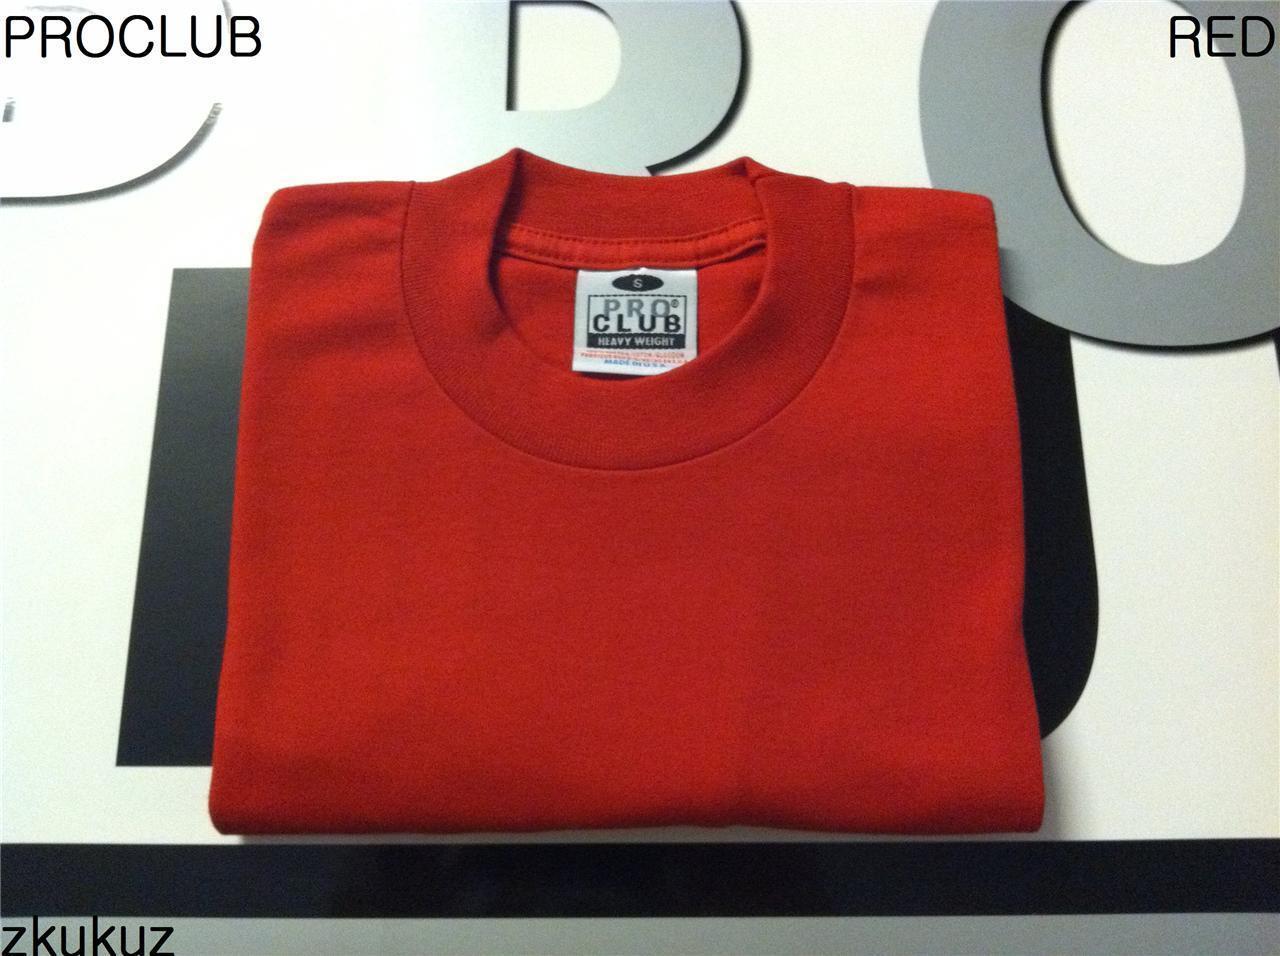 6 NEW PROCLUB HEAVY WEIGHT T-SHIRT RED PLAIN PRO CLUB BLANK S-5XLT 6PC